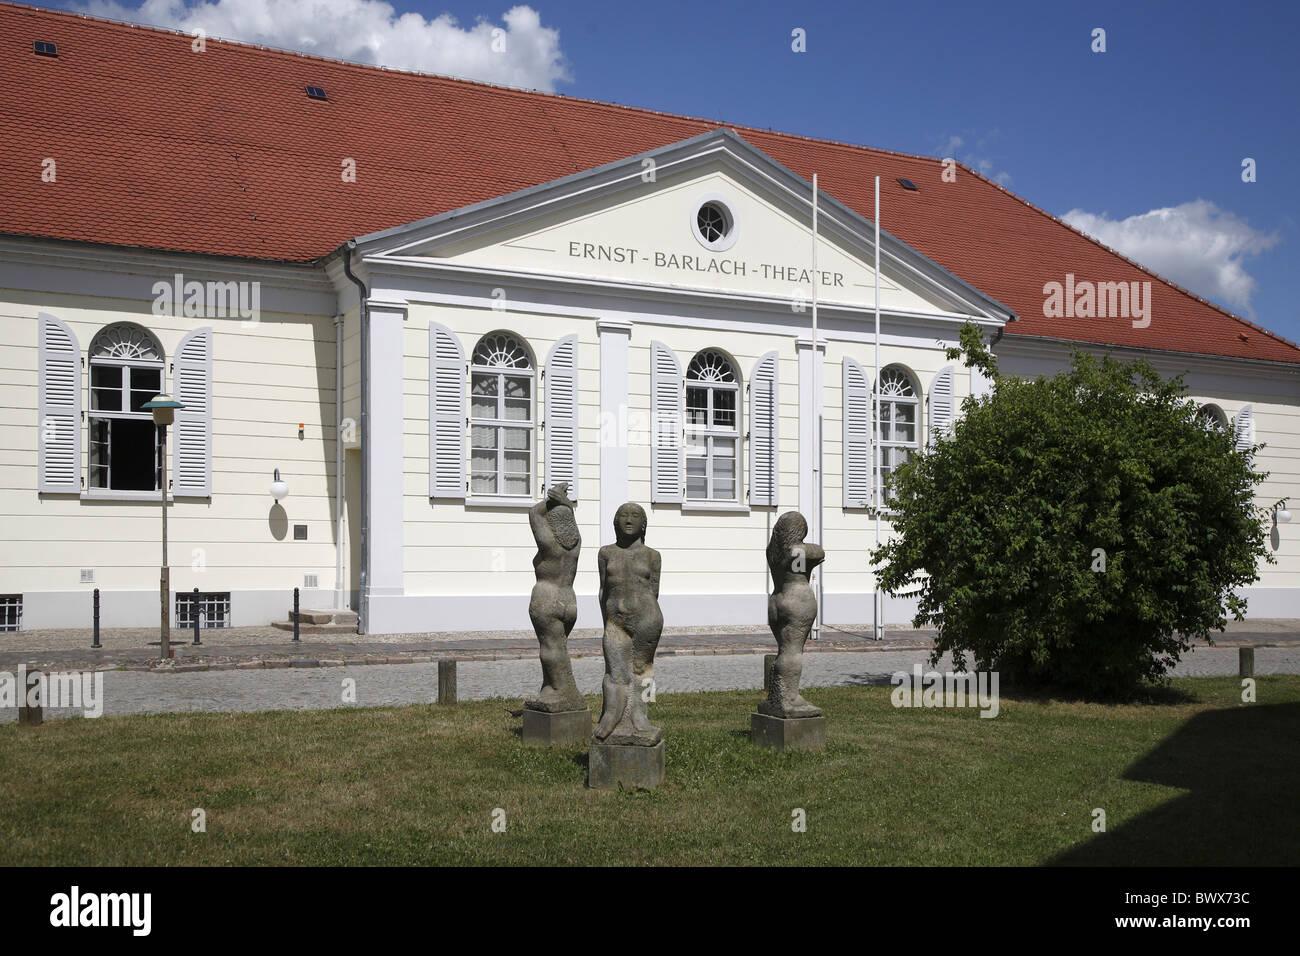 Güstrow Ernst Barlach Theater - Stock Image